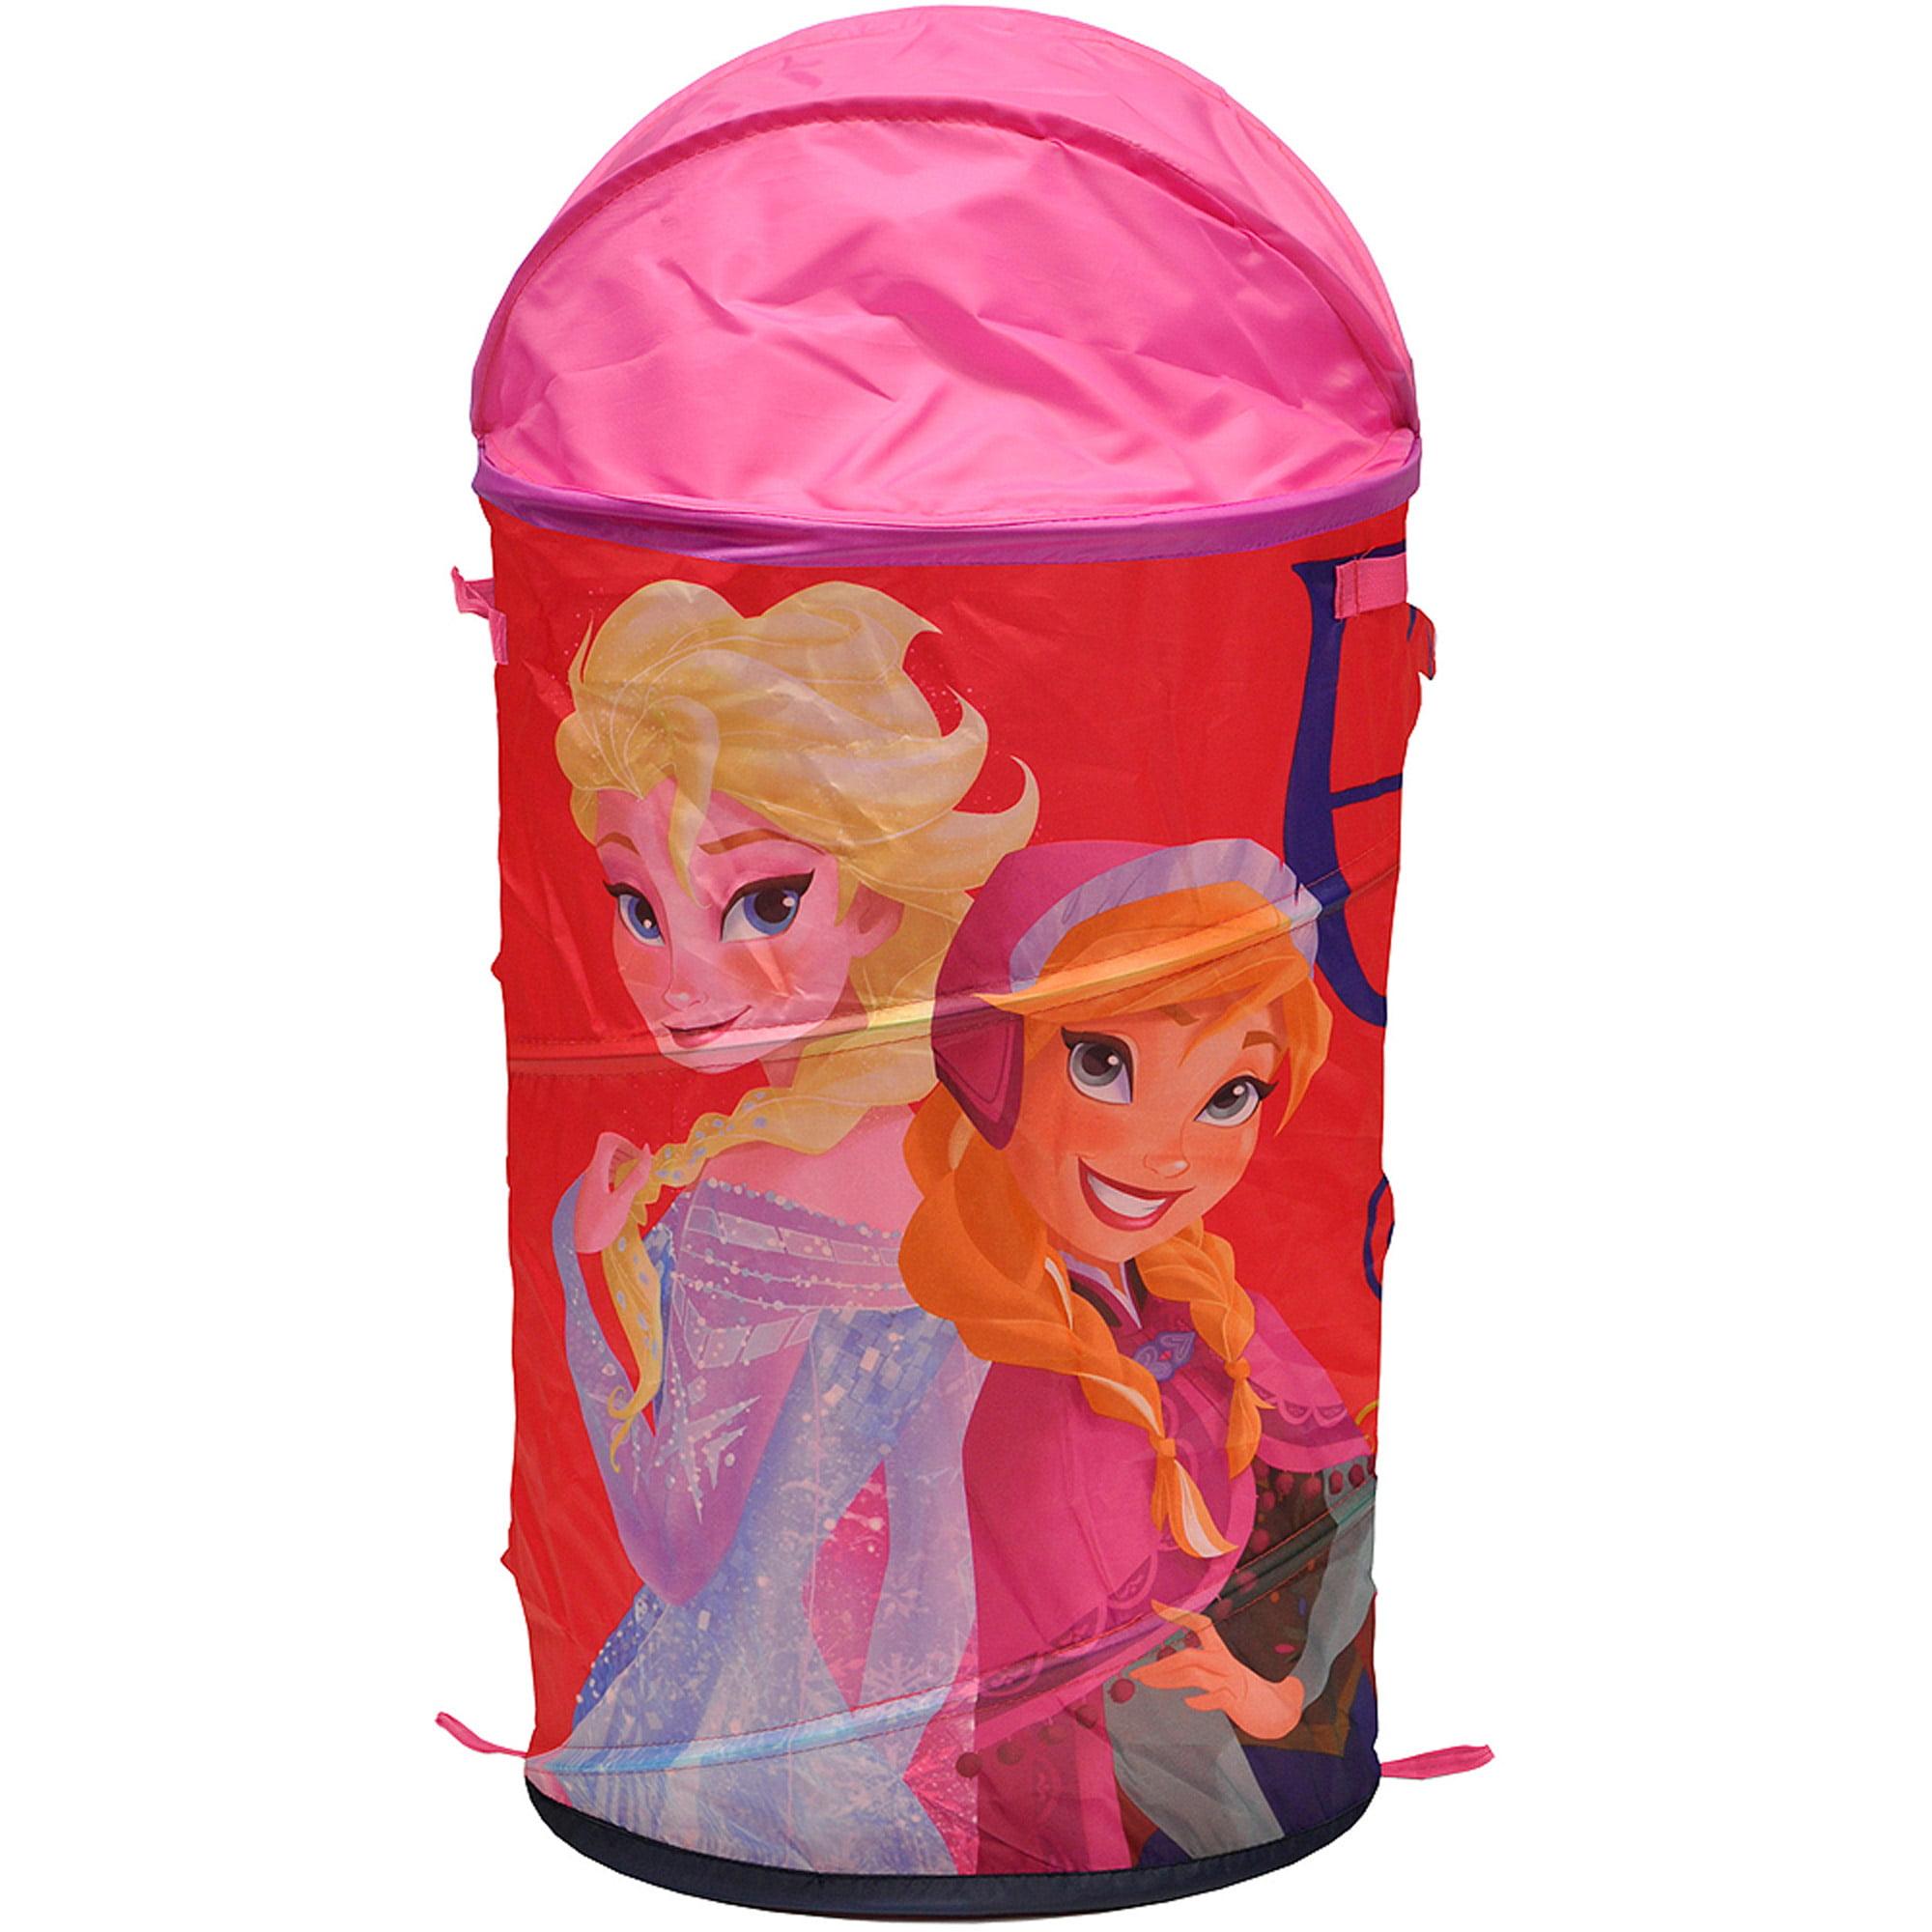 Disney Frozen Laundry Pop Up Hamper With Dome Lid